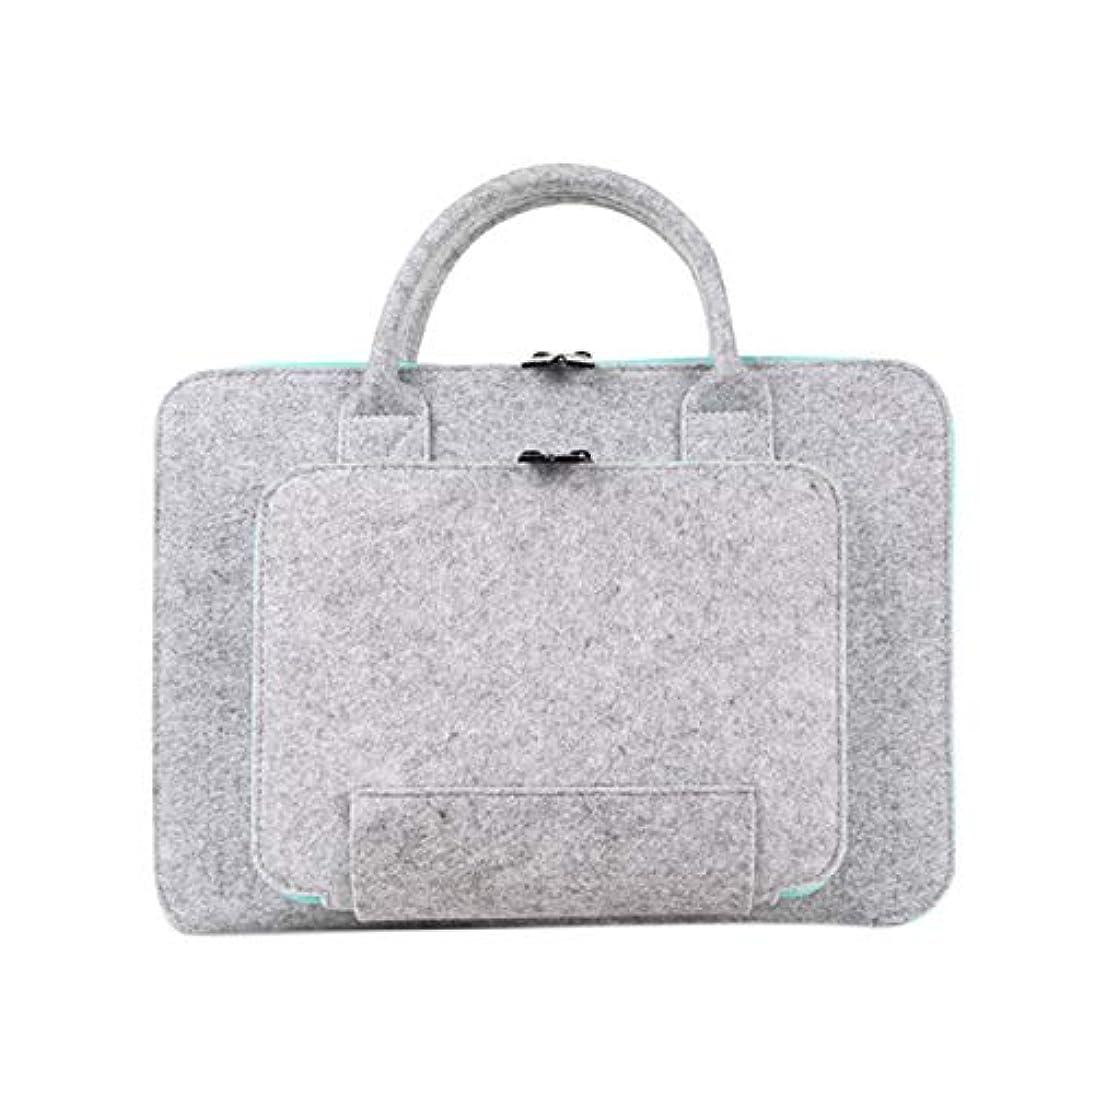 TOOGOO 13 15.6 17 Super Light Wool Felt Laptop Bag for Dell Computer Bag Notebook Case(15.6Inch) xcoq697963465895